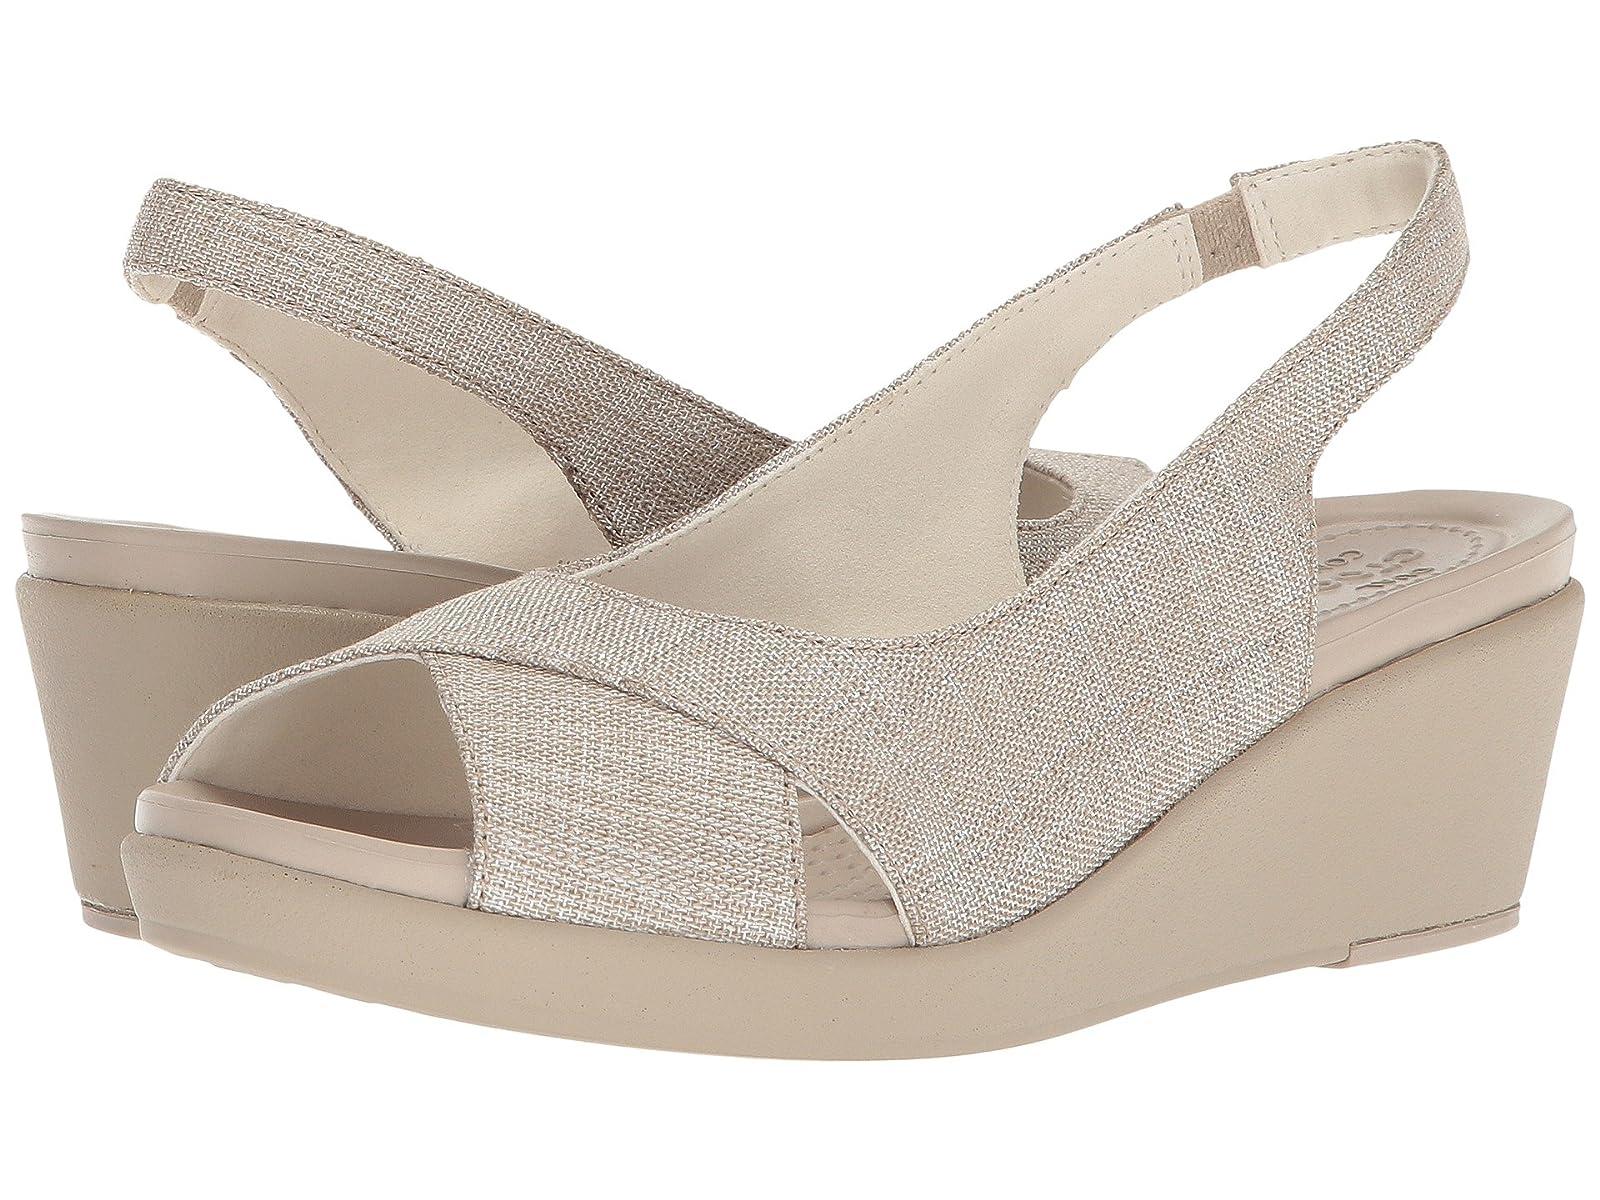 Crocs Leigh Ann Shimmer Slingback WedgeAtmospheric grades have affordable shoes